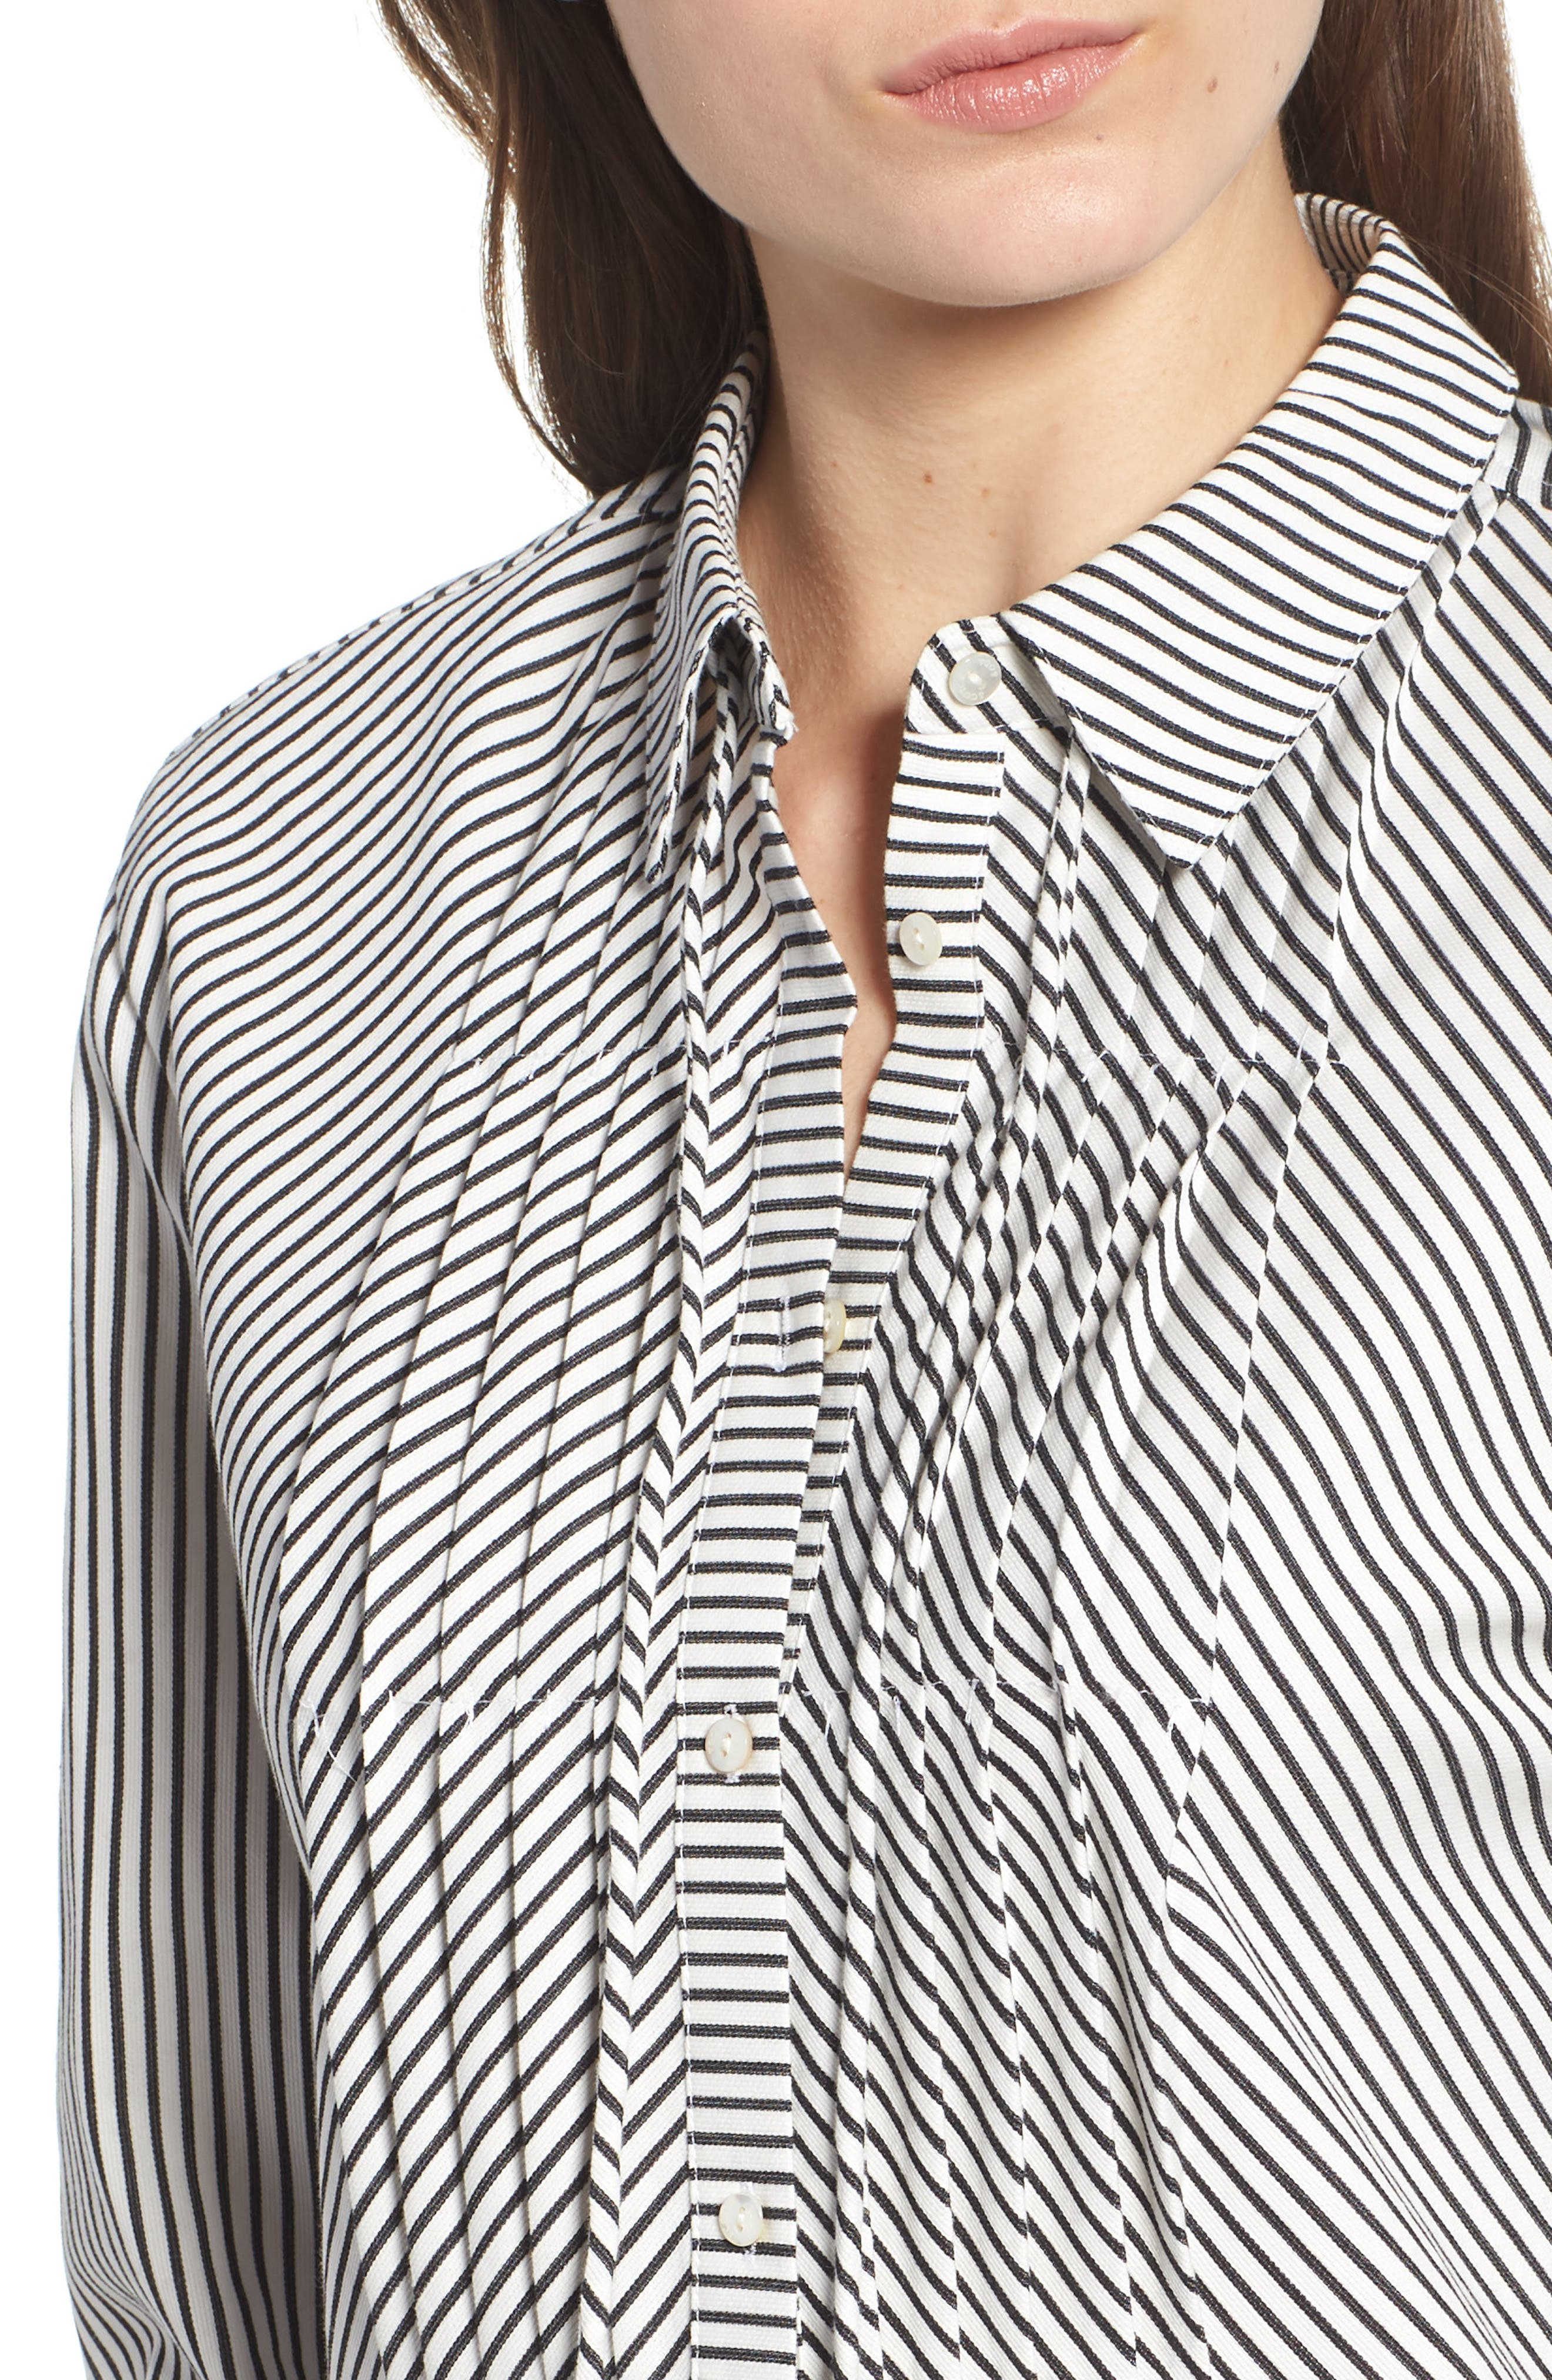 Stripe Pleat Shirt,                             Alternate thumbnail 4, color,                             BLACK/ WHITE PIN STRIPE